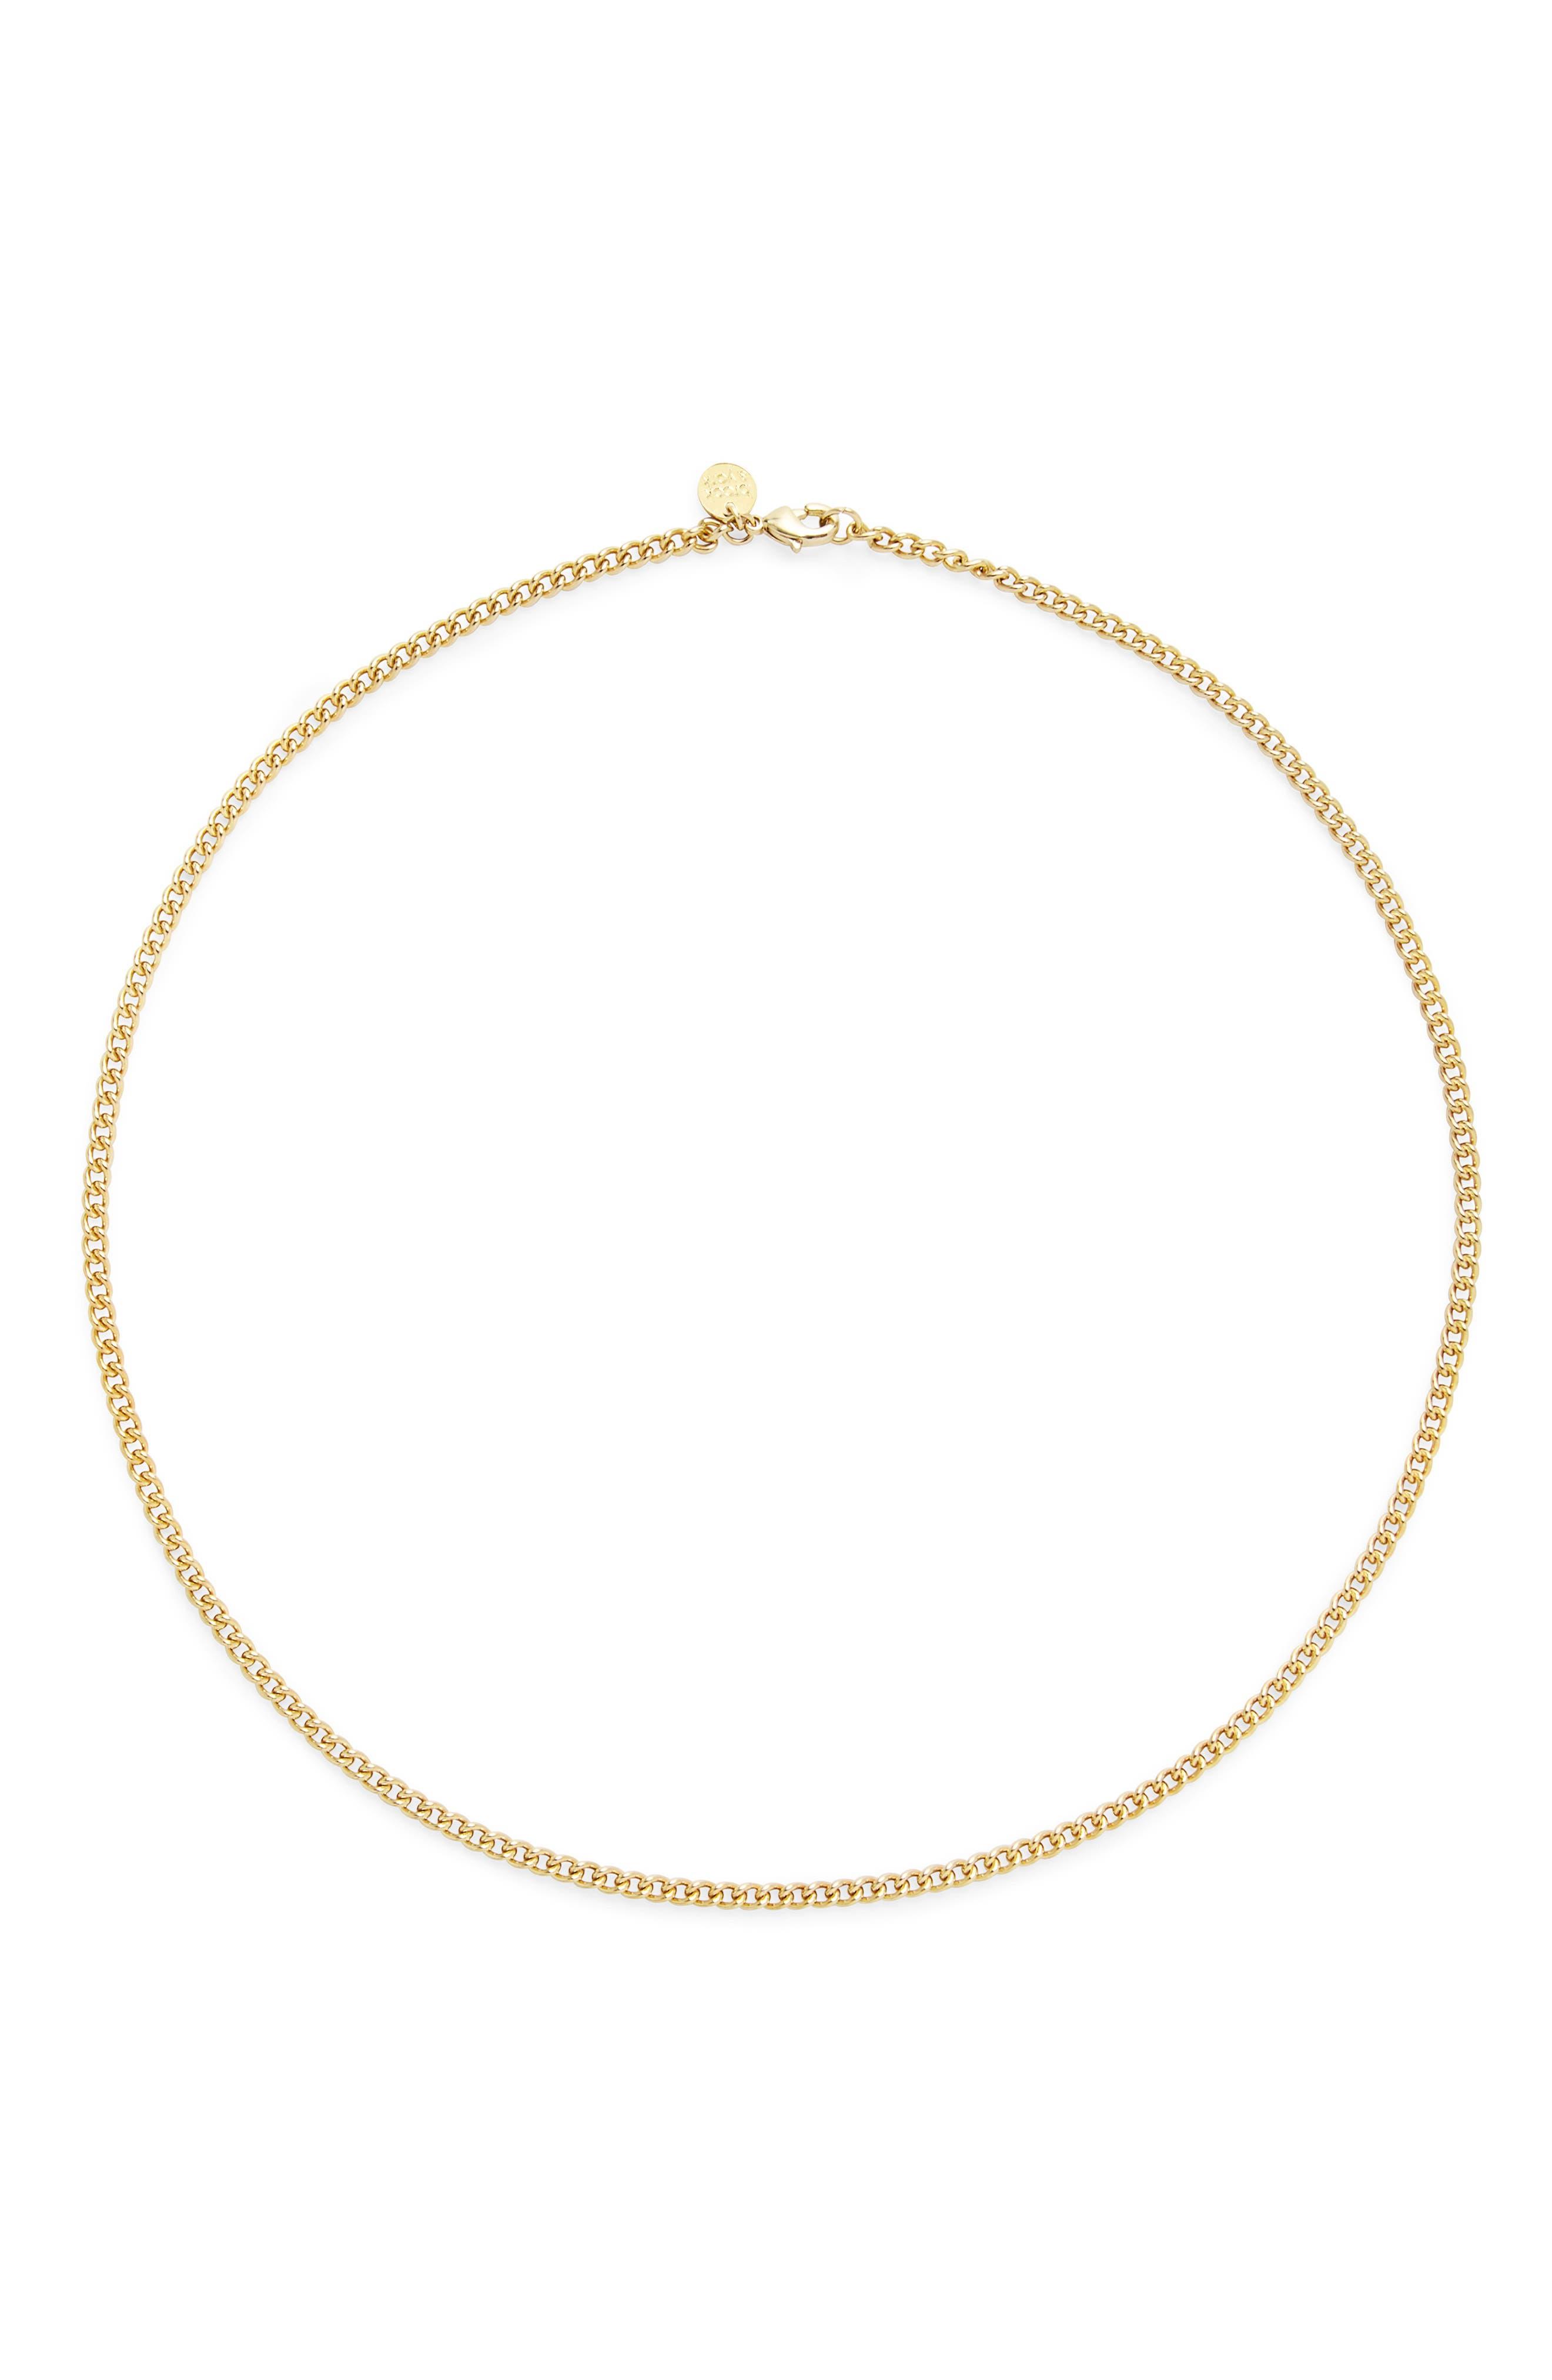 Stella Curb Chain Necklace